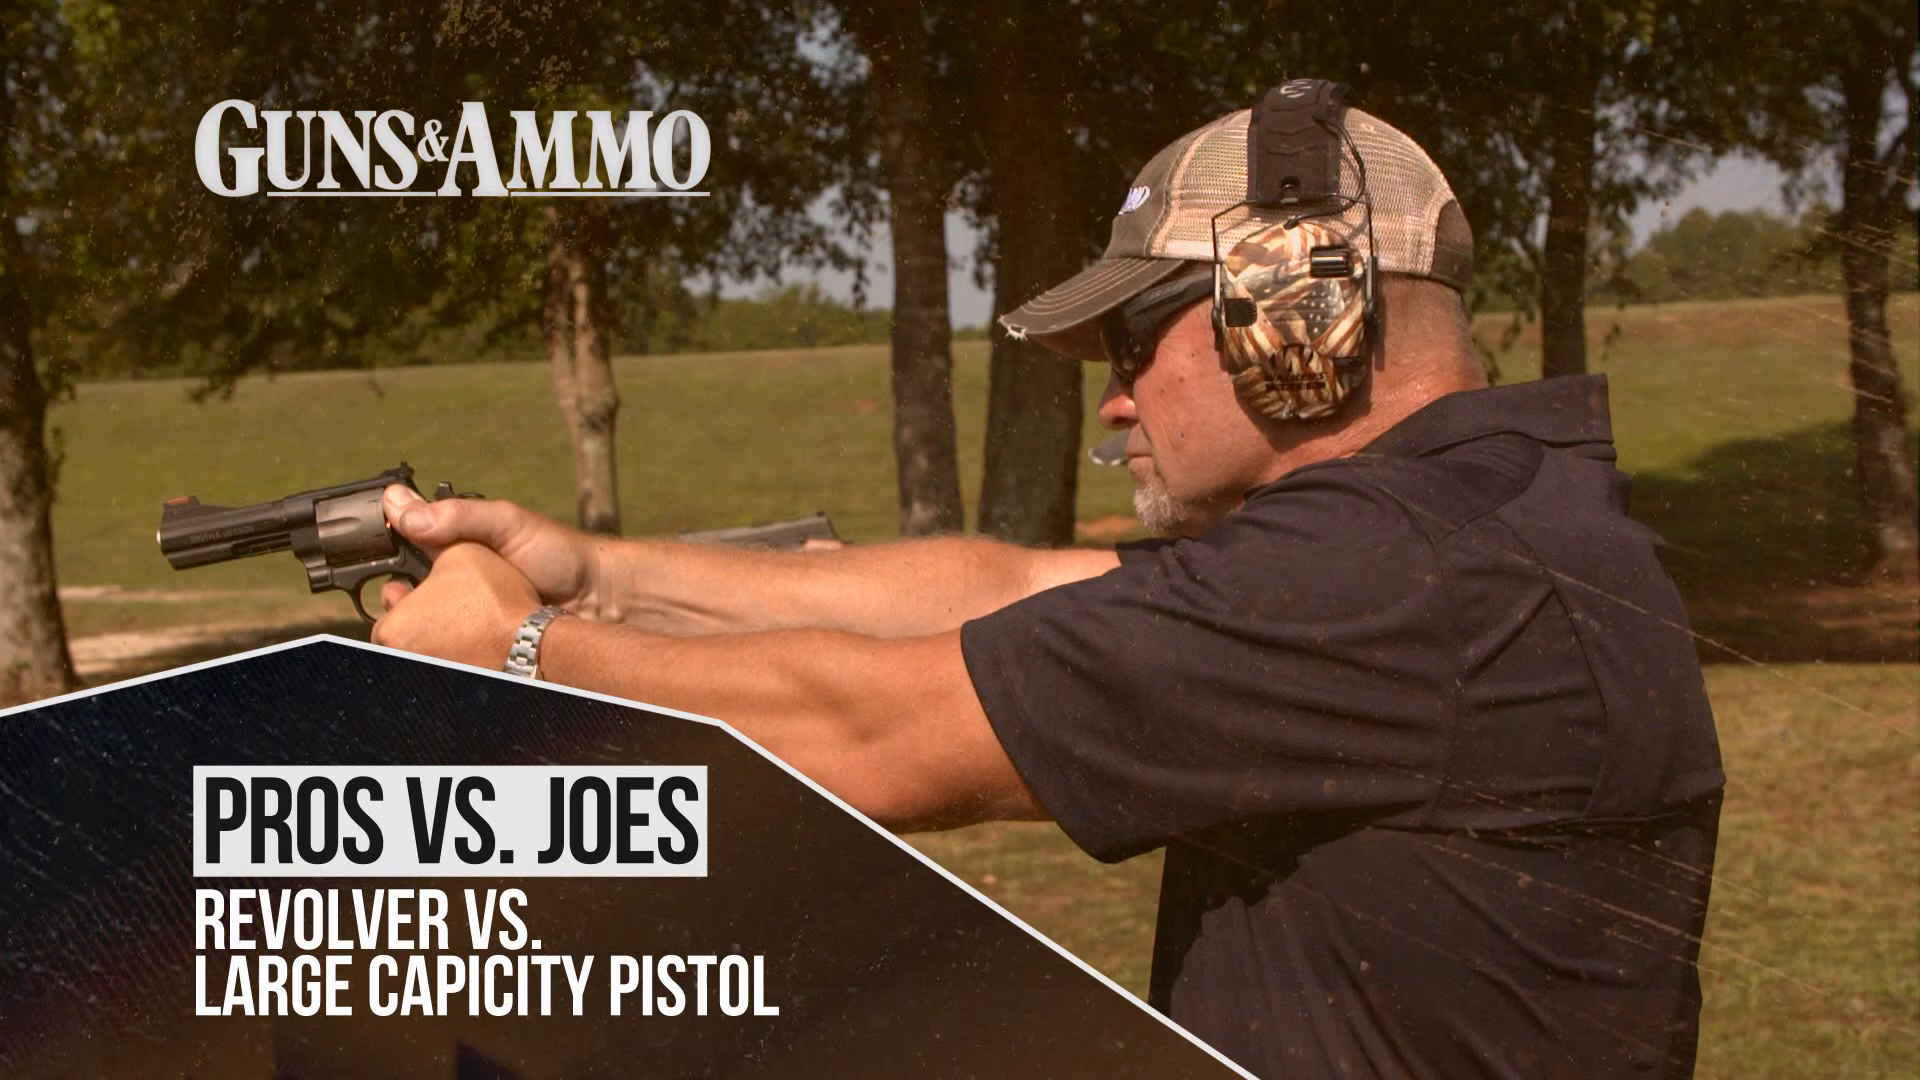 Revolver VS. Large Capicity Pistol